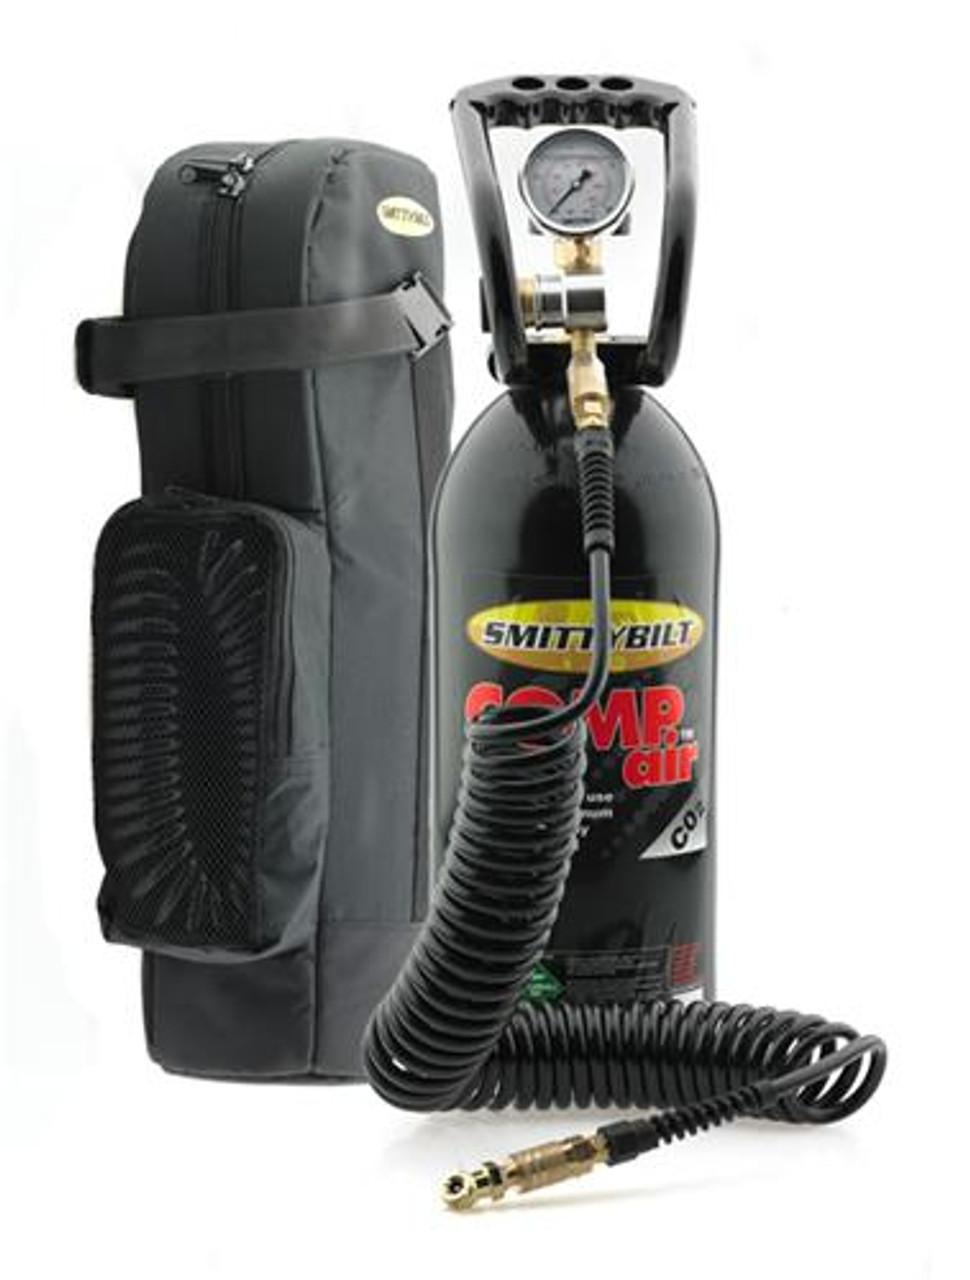 Smittybilt COMPAIR Compact Air System